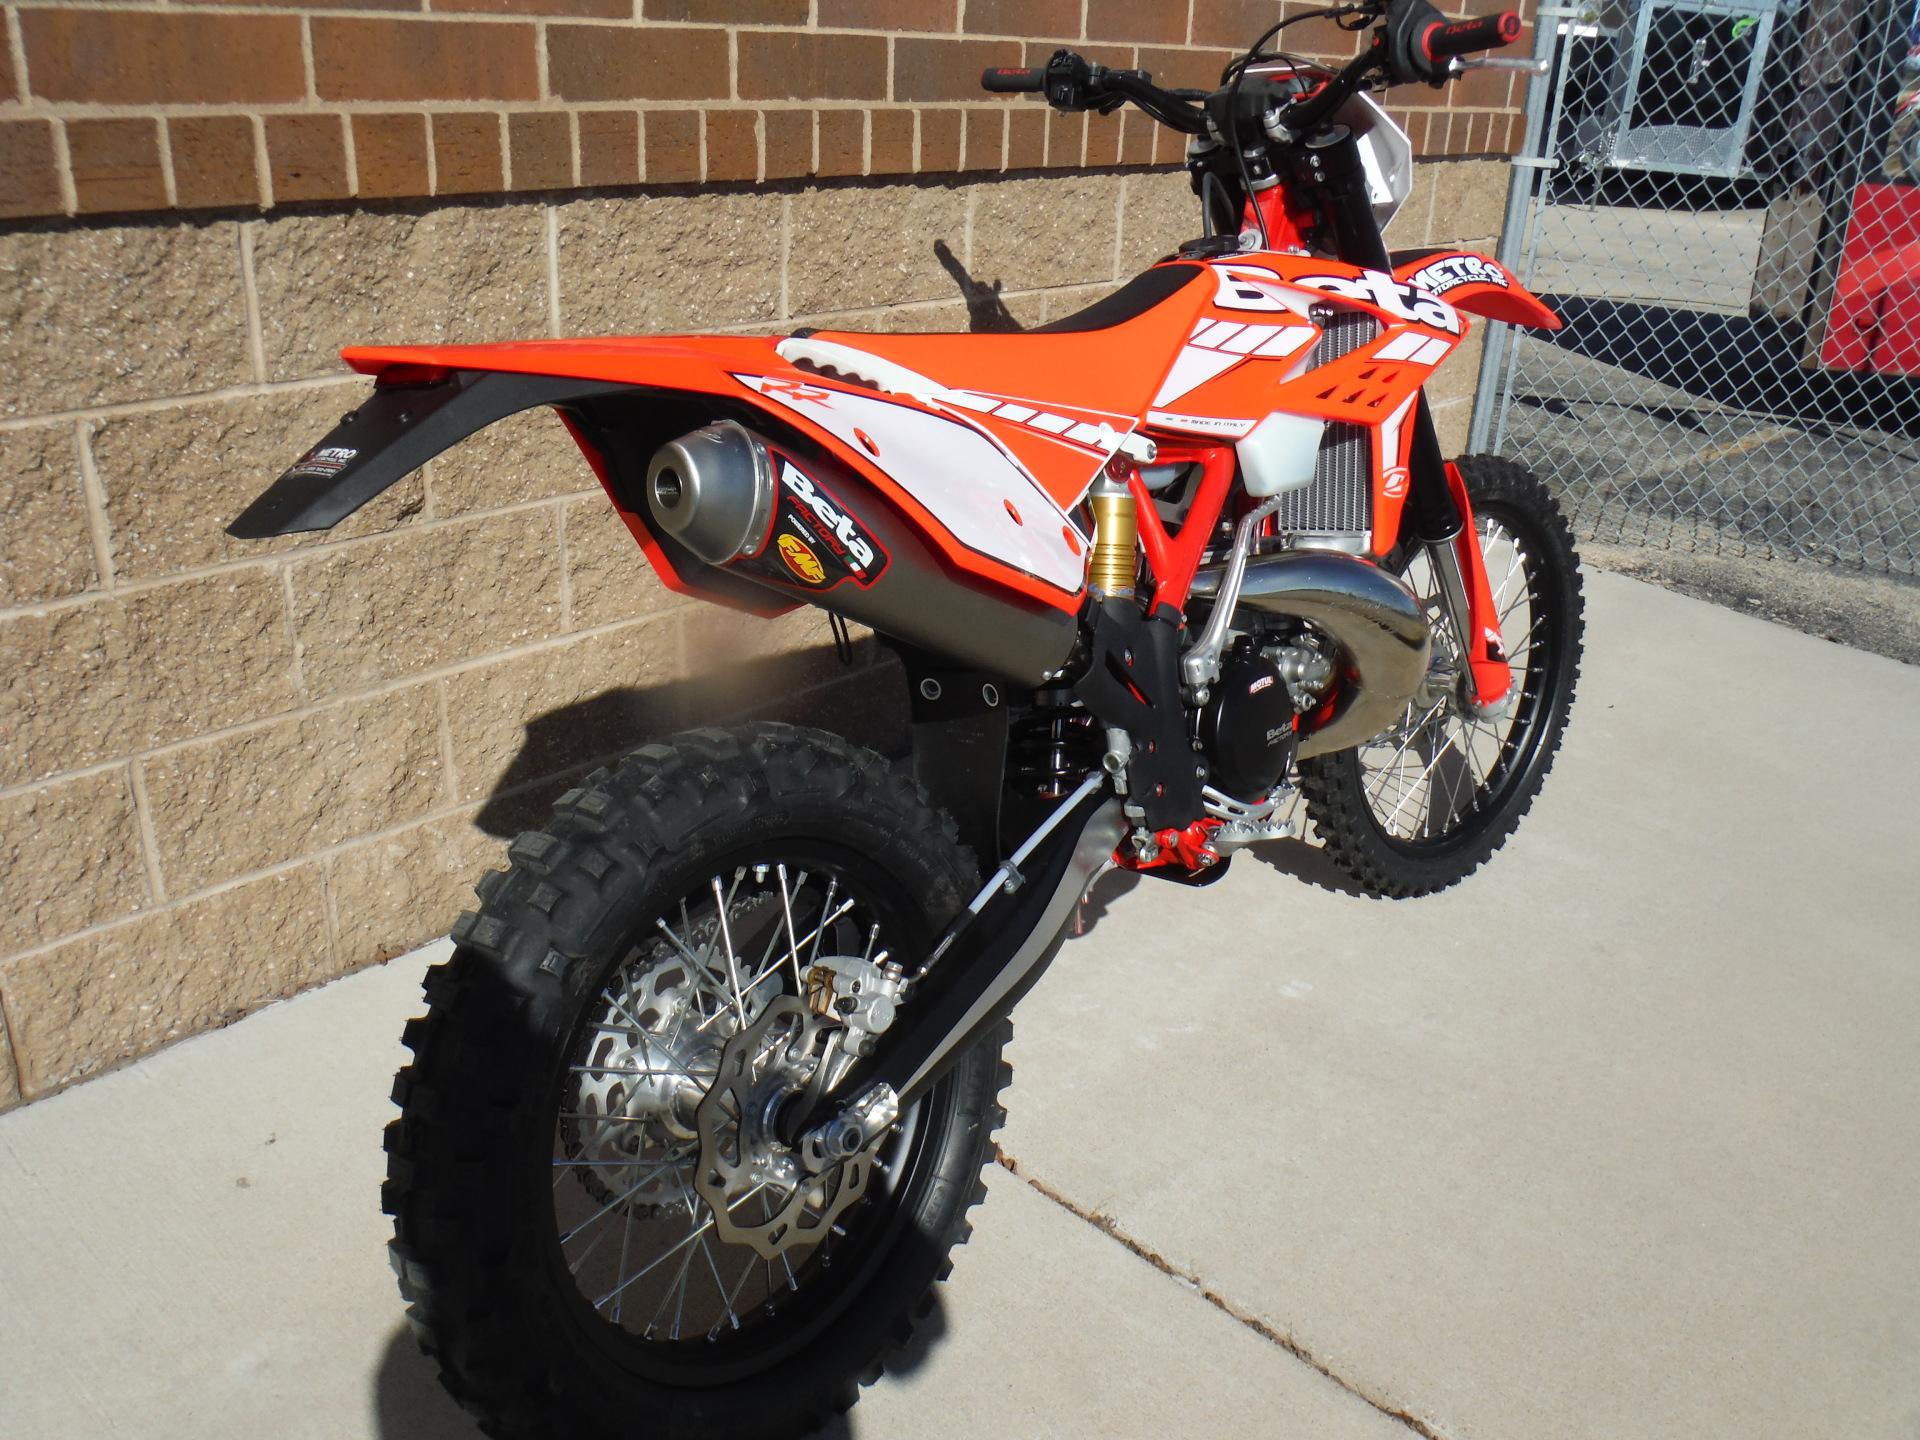 2015 Beta Team Rider practice bike